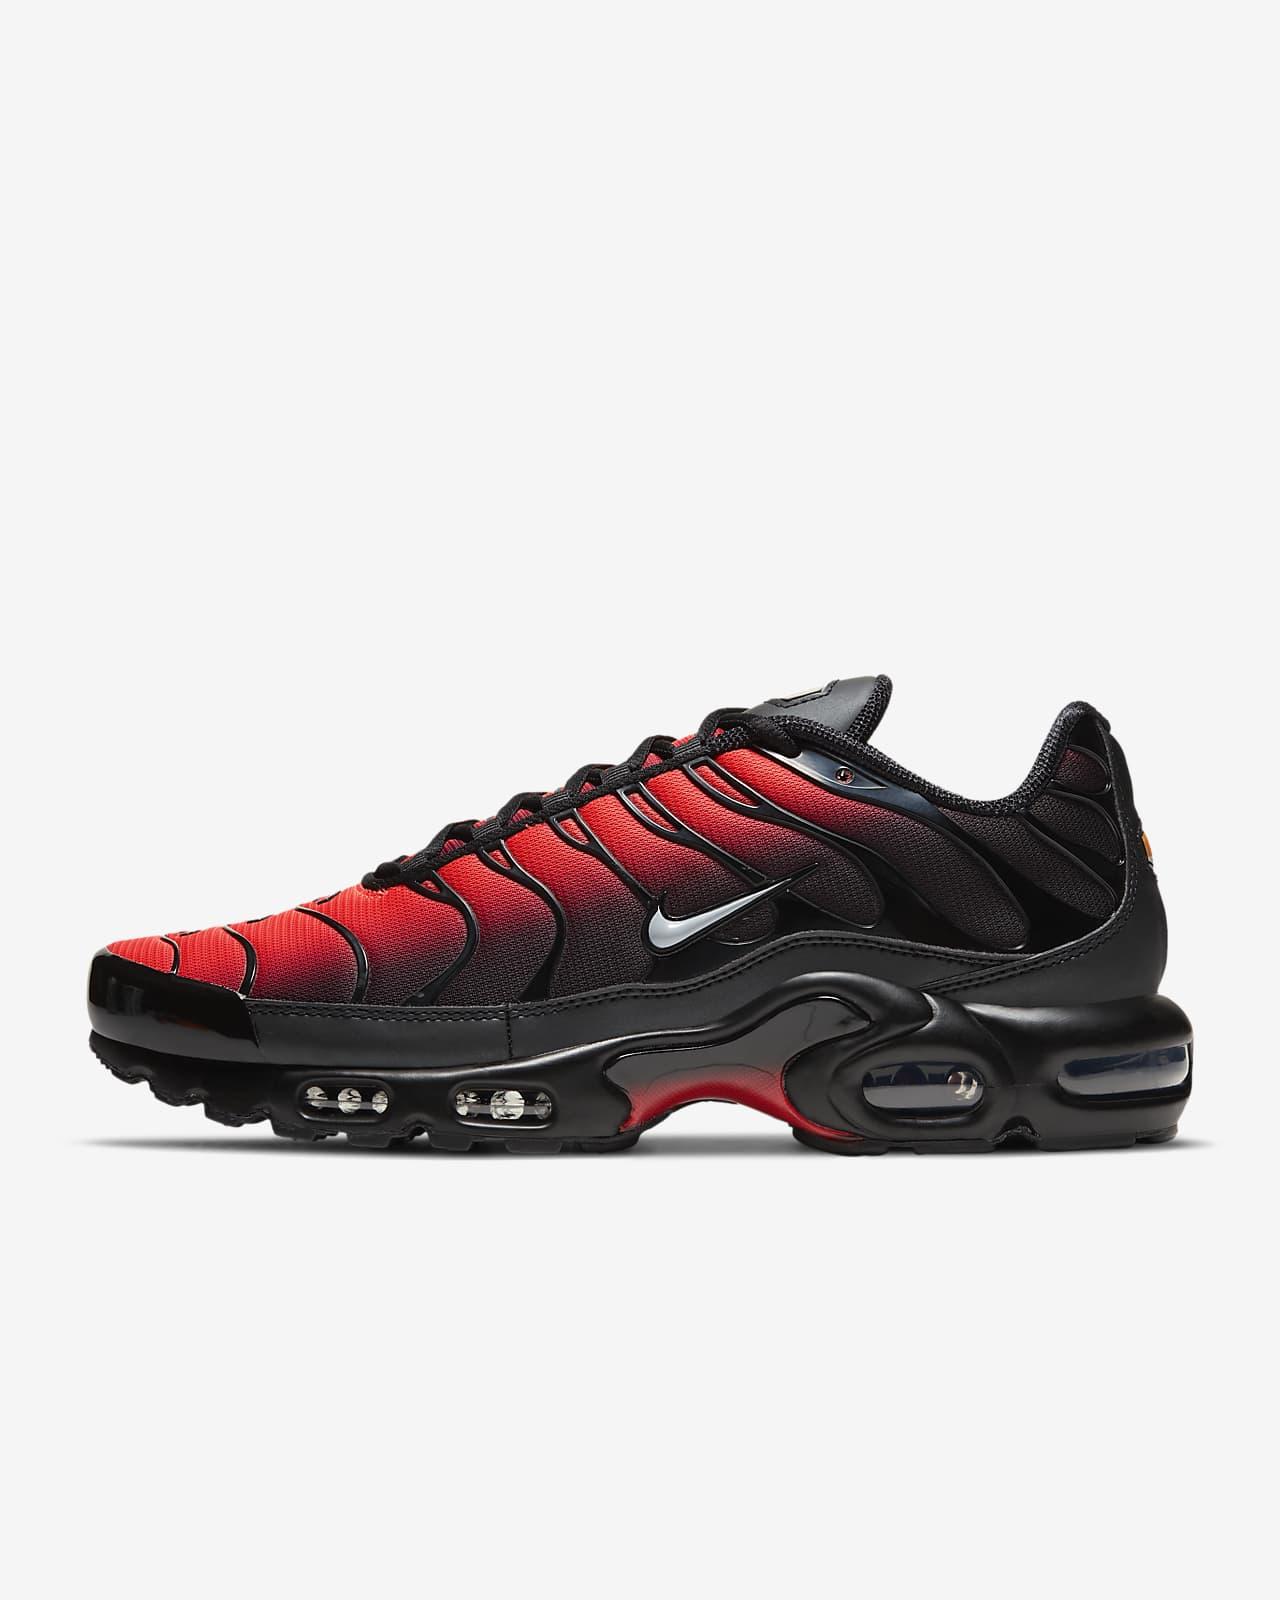 Nike Air Max Plus Men's Shoe. Nike AE